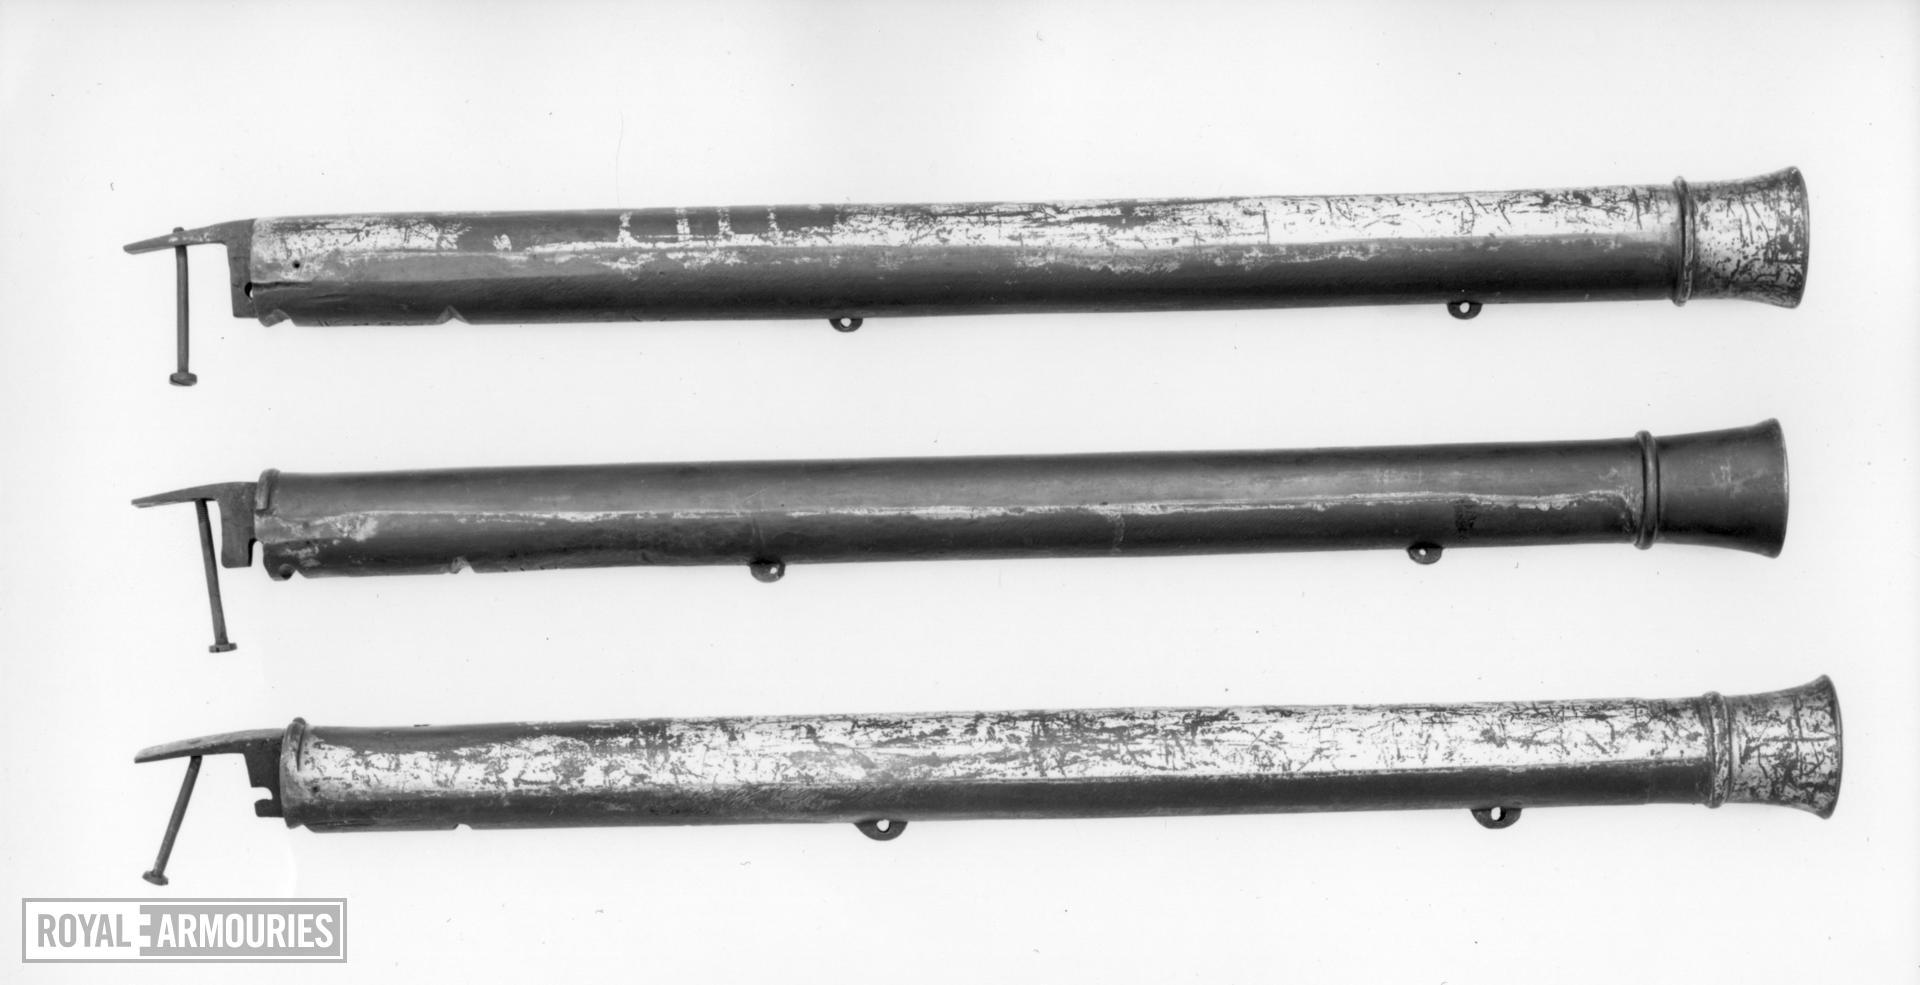 Musketoon barrel